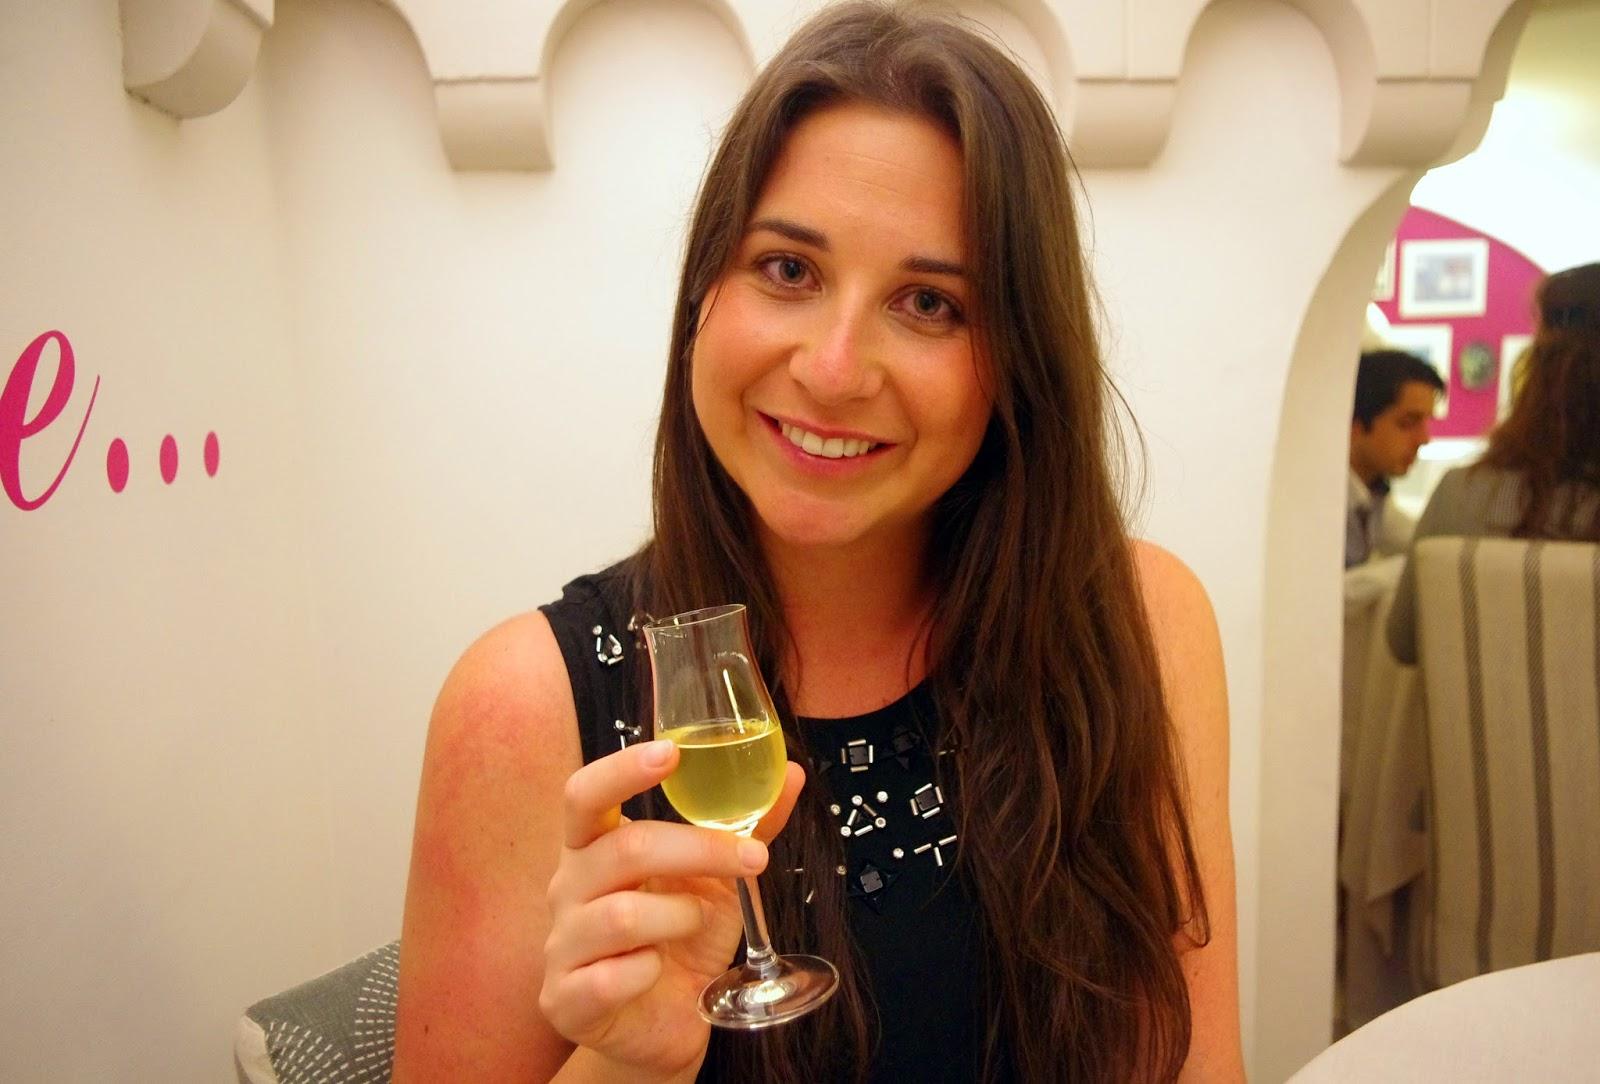 Girl drinking Limoncello in Il Buco Restaurant Sorrento Italy